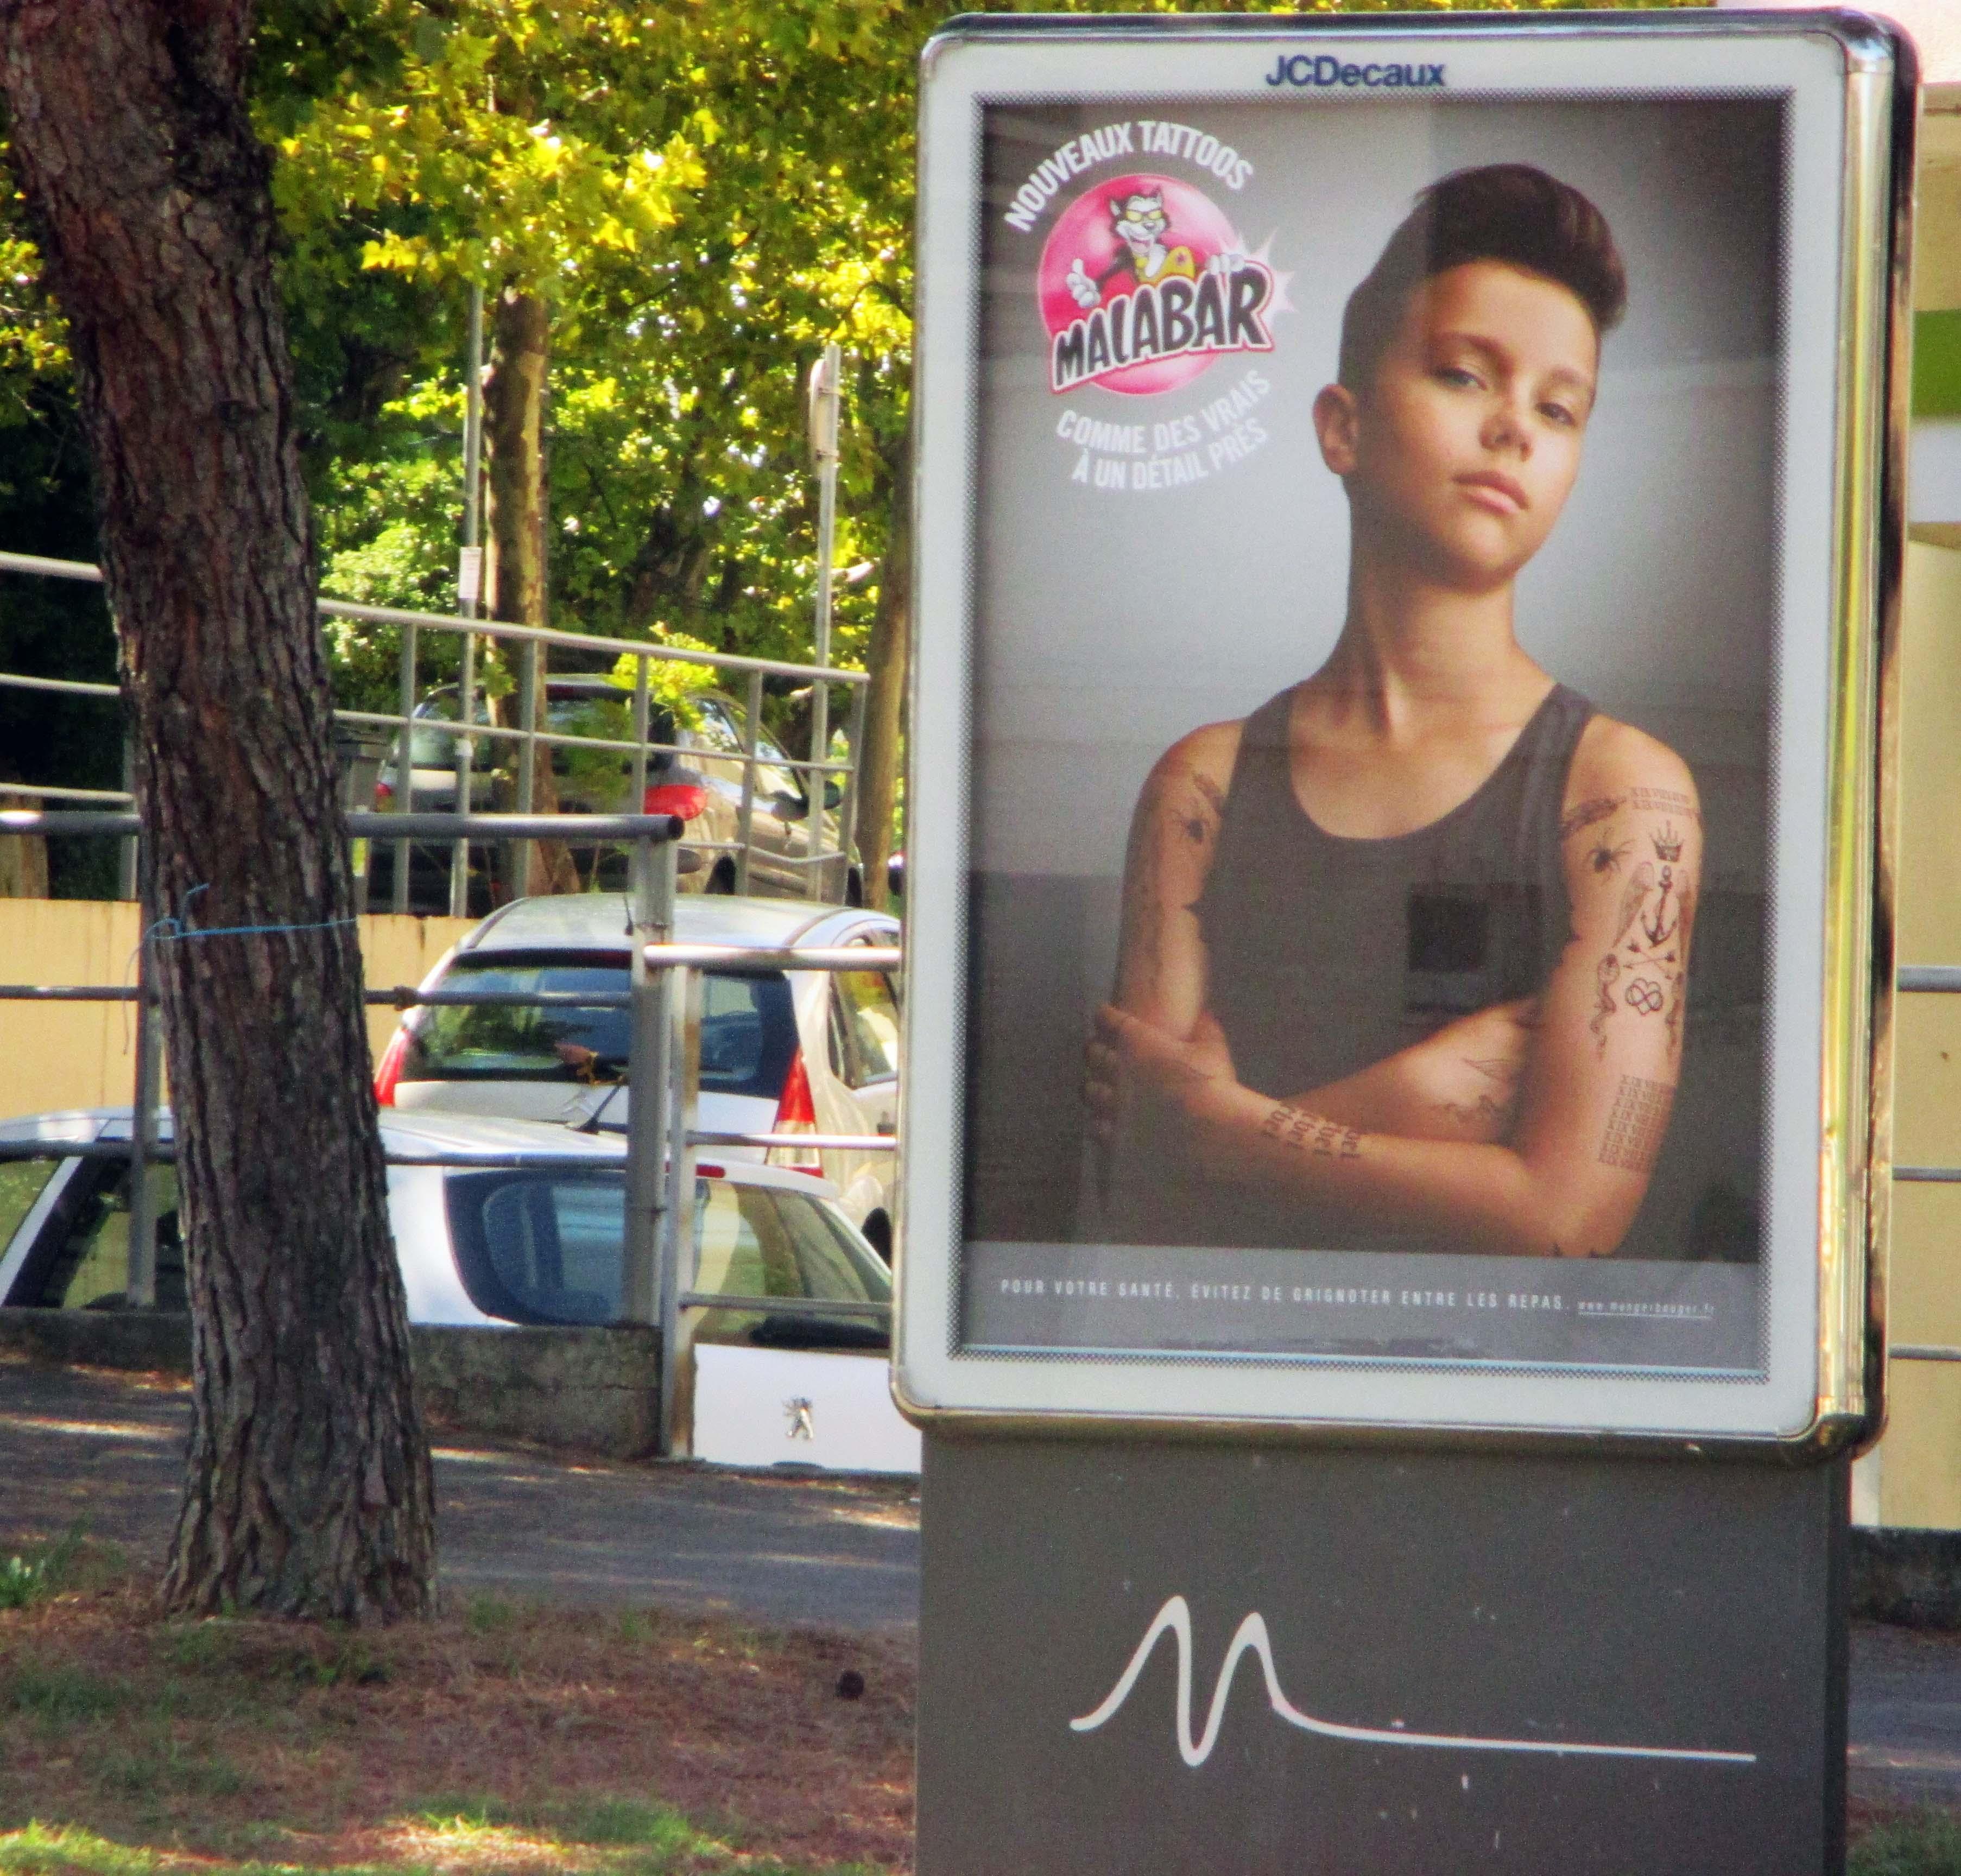 malabar tatouage affiche